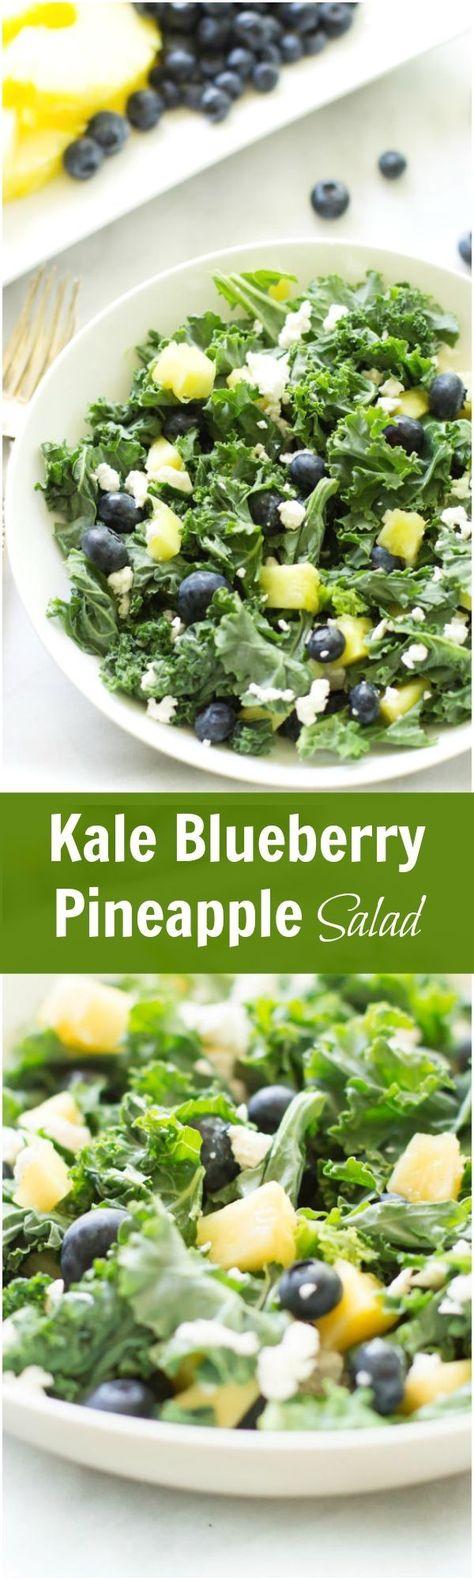 Kale Blueberry Pineapple Salad - Kale blueberry pineapple salad is sweet, tart, and full of vitamins. #kalesalad #healthylunch #blueberrypineapple #summersalad #primaverakitchen